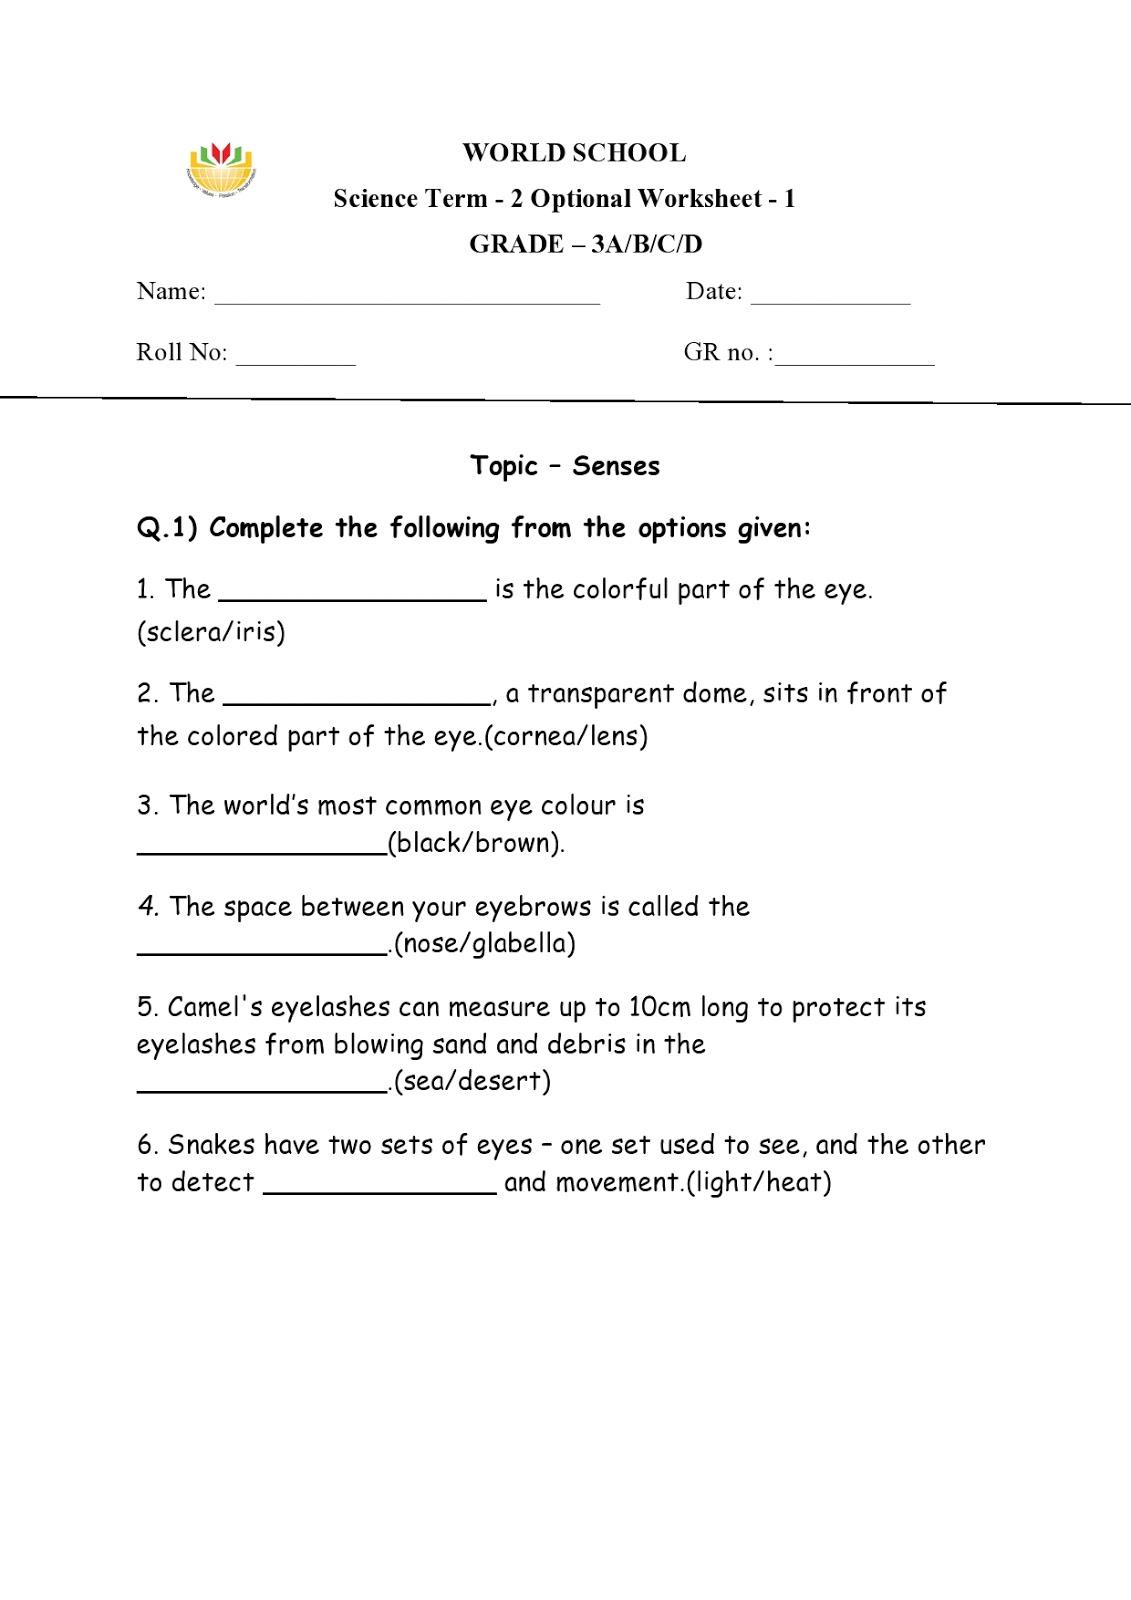 small resolution of WORLD SCHOOL OMAN: Homework for Grade 3 as on 19-02-2019